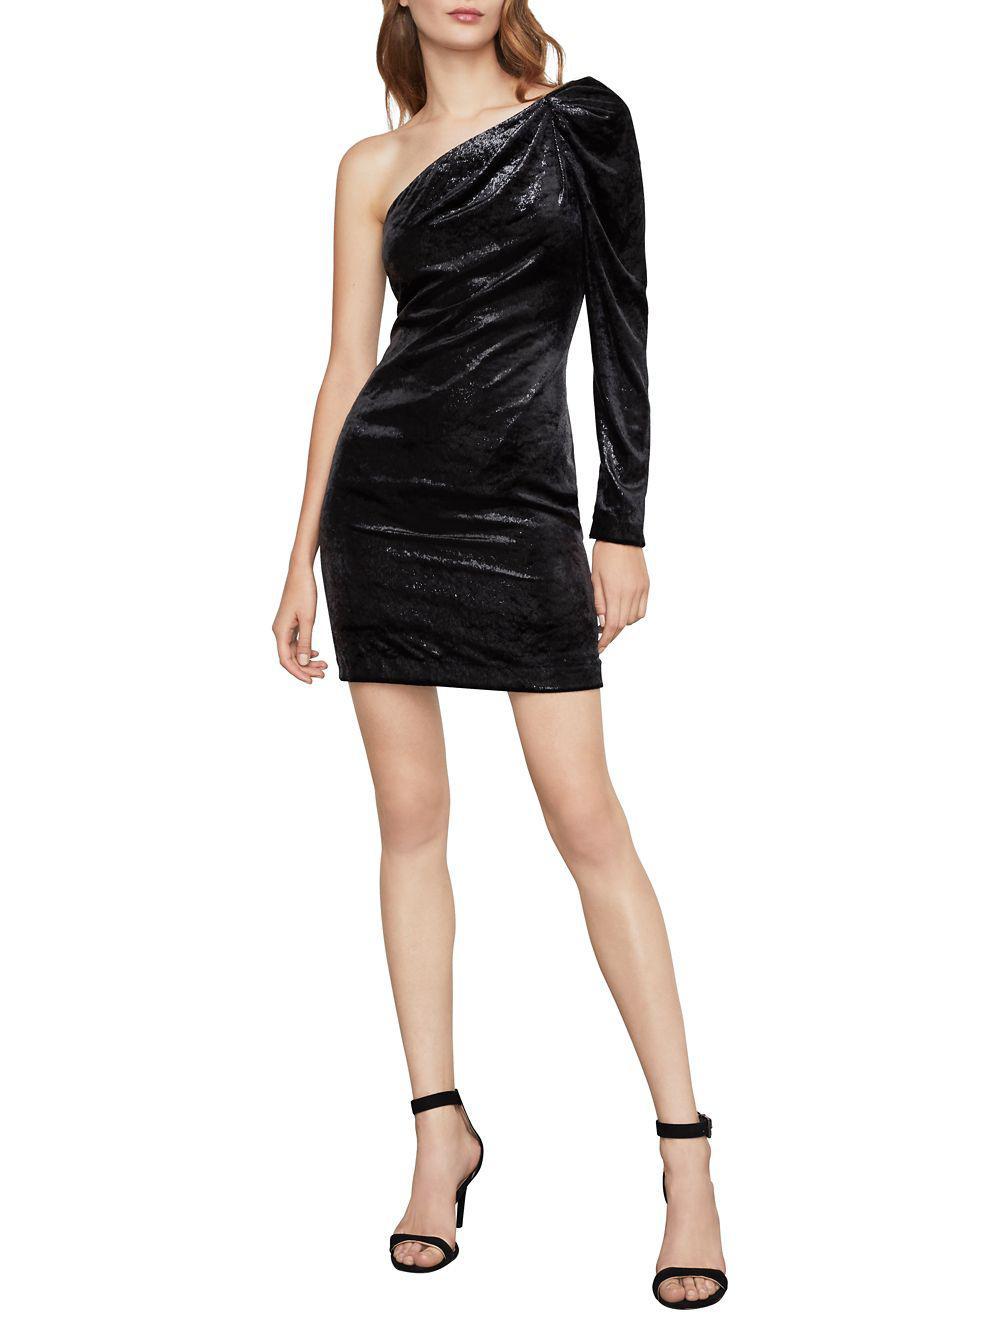 9e2aedb0d9c1 Bcbgmaxazria One-shoulder Shift Dress in Black - Lyst